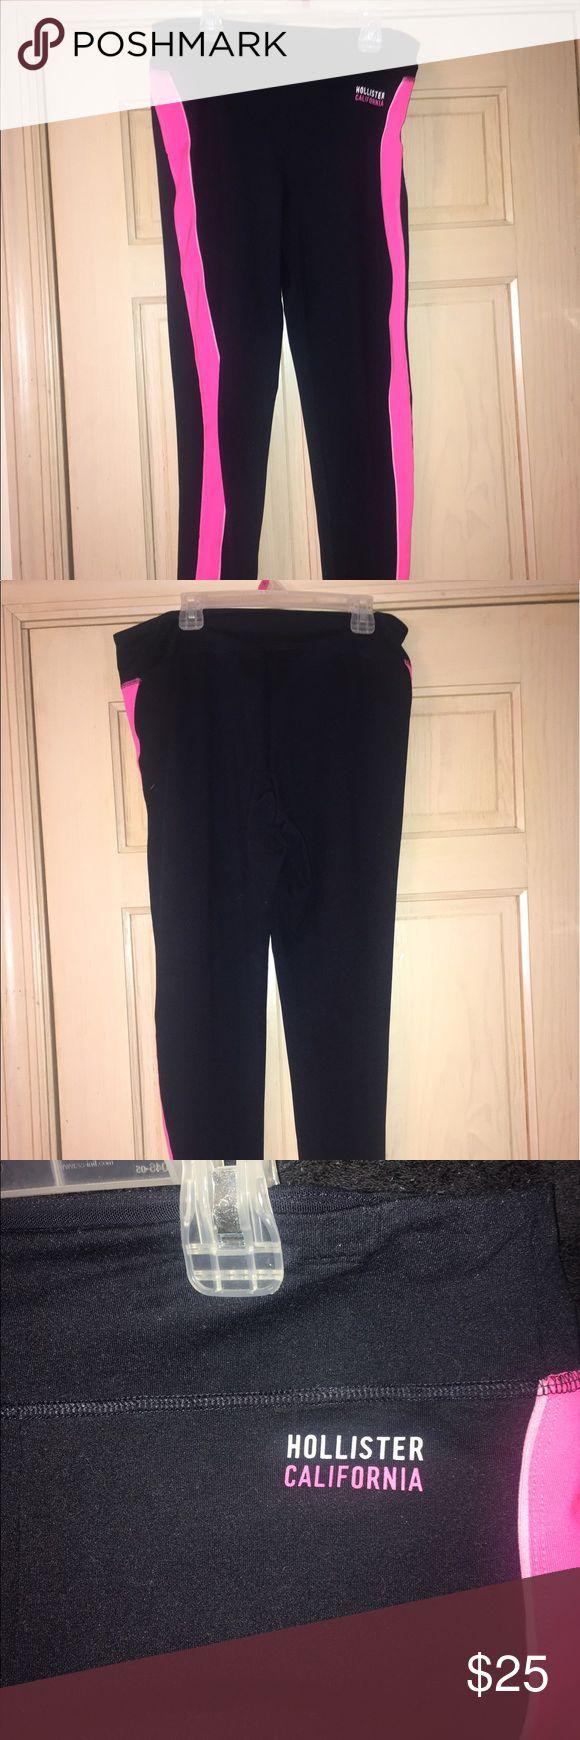 Hollister leggings Never worn!! Perfect condition Hollister Pants Leggings